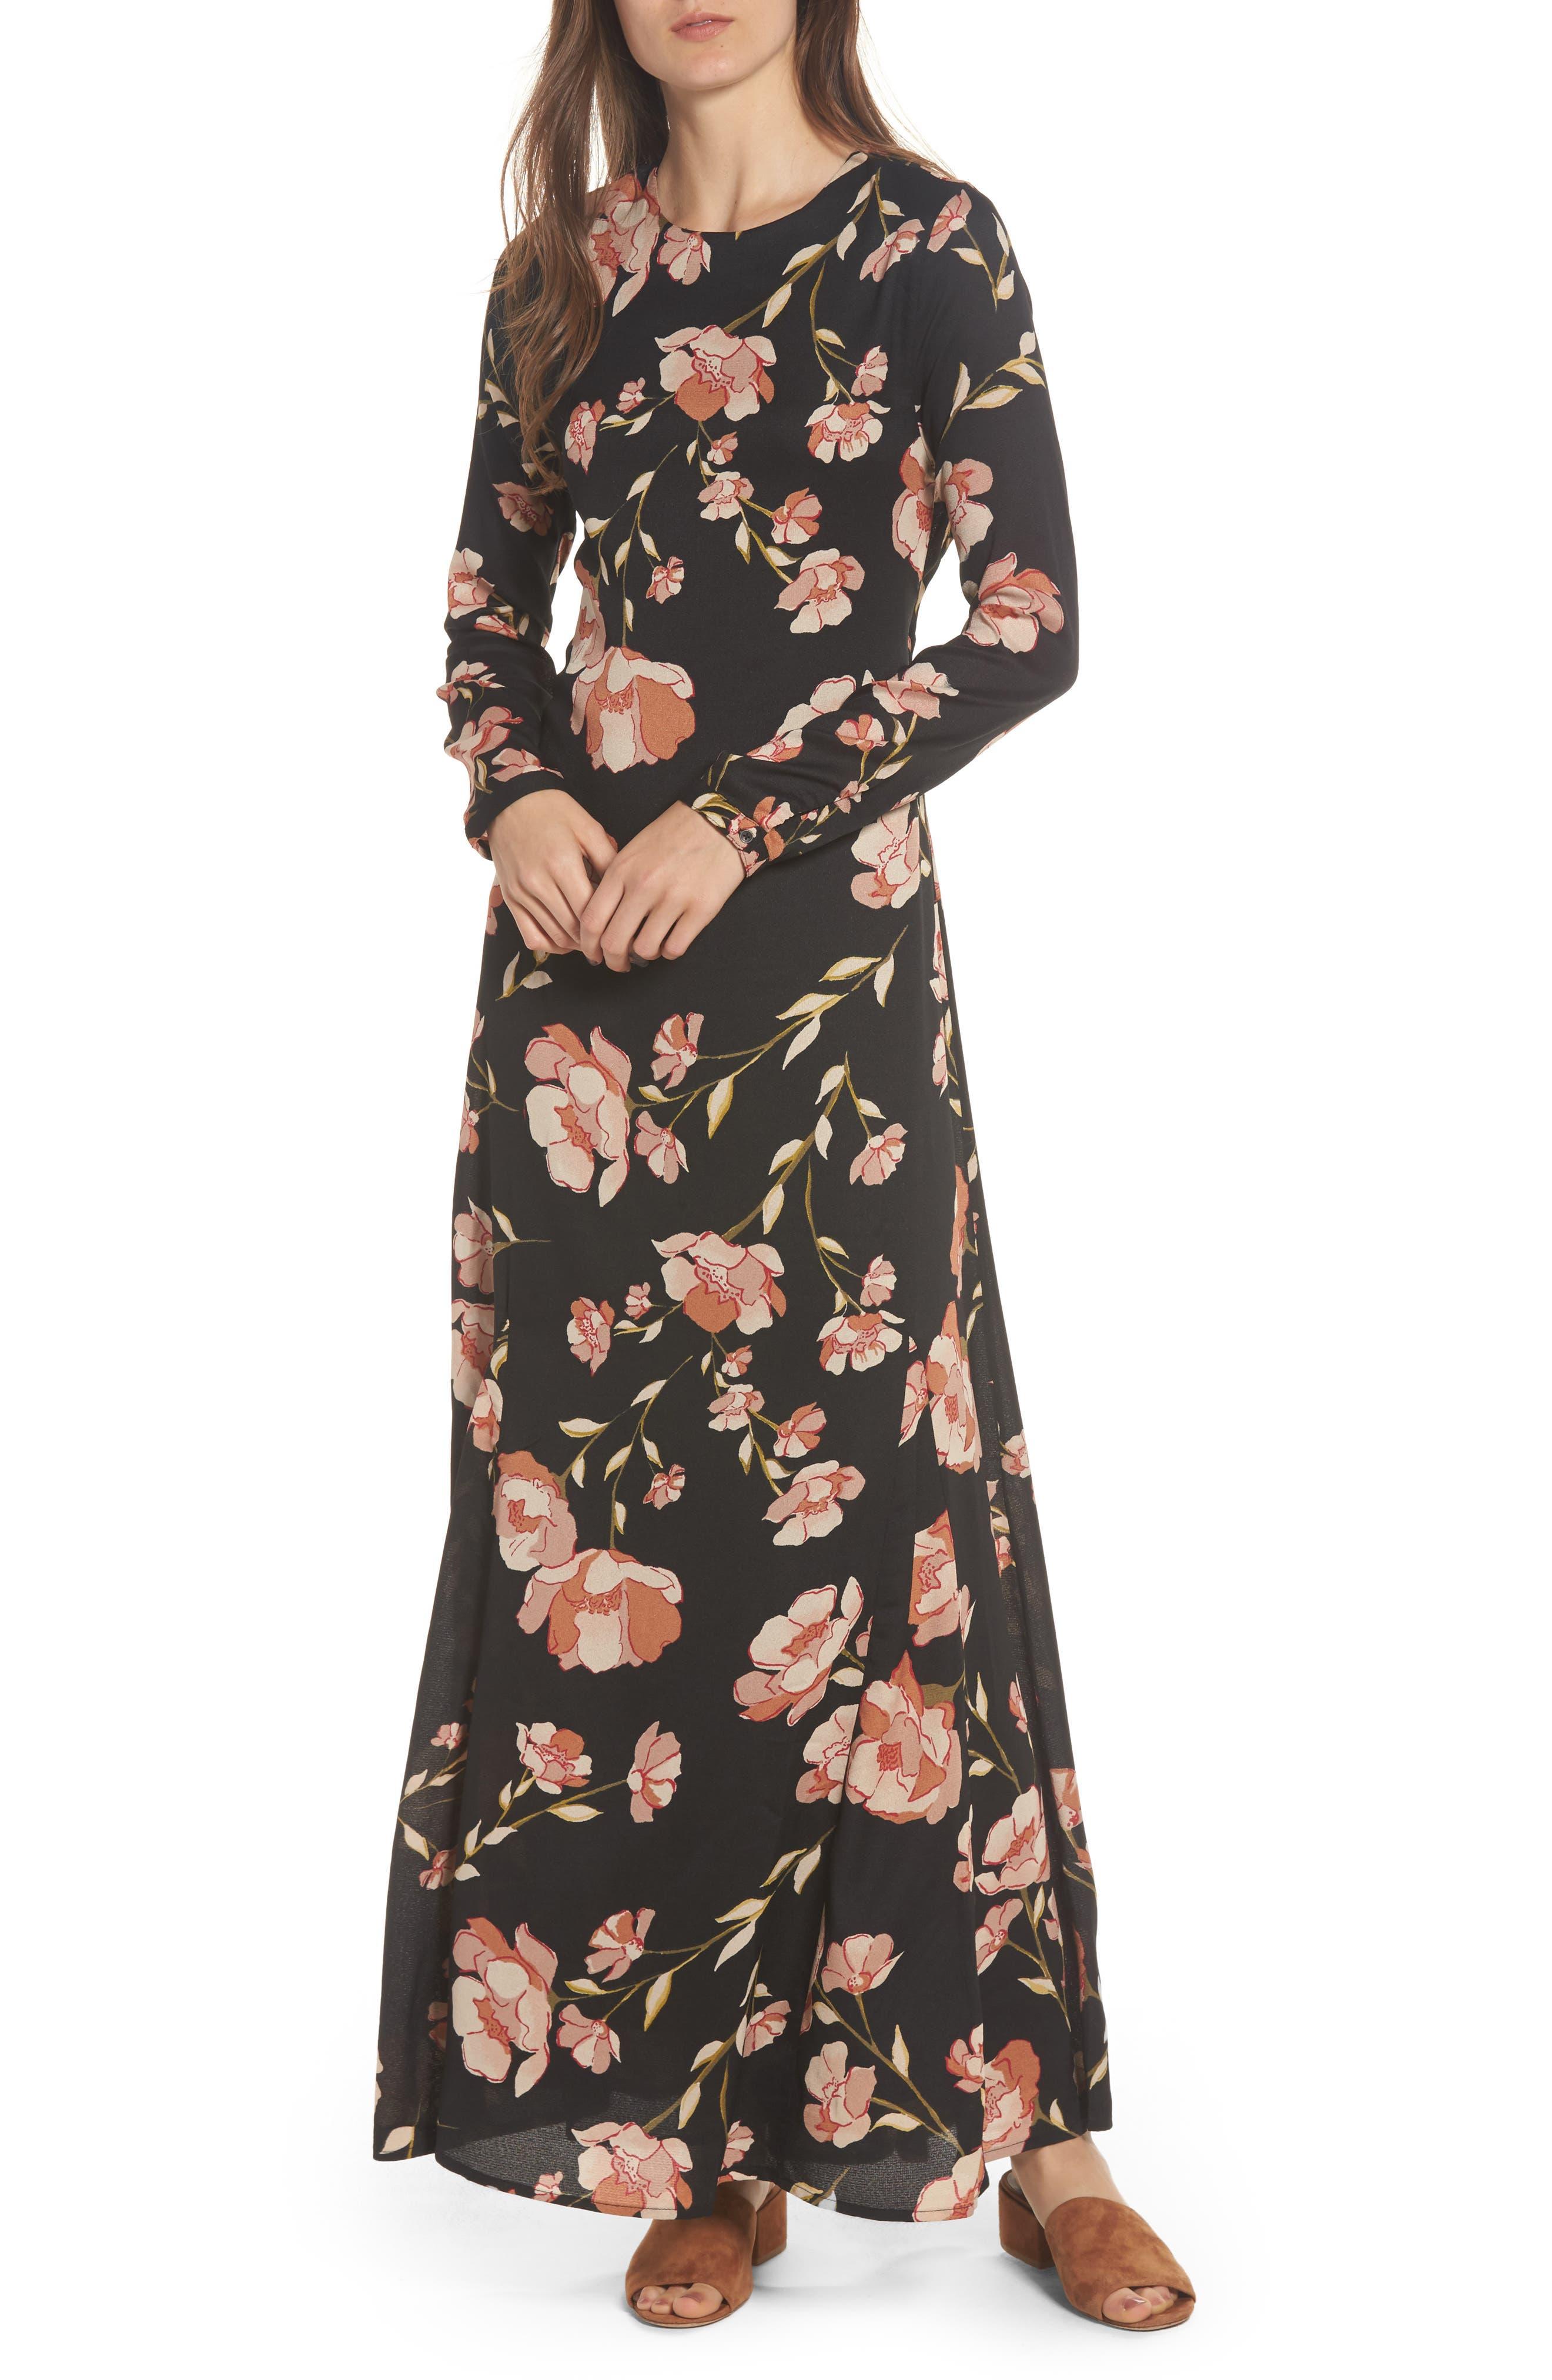 Floral Print Maxi Dress,                             Main thumbnail 1, color,                             Black